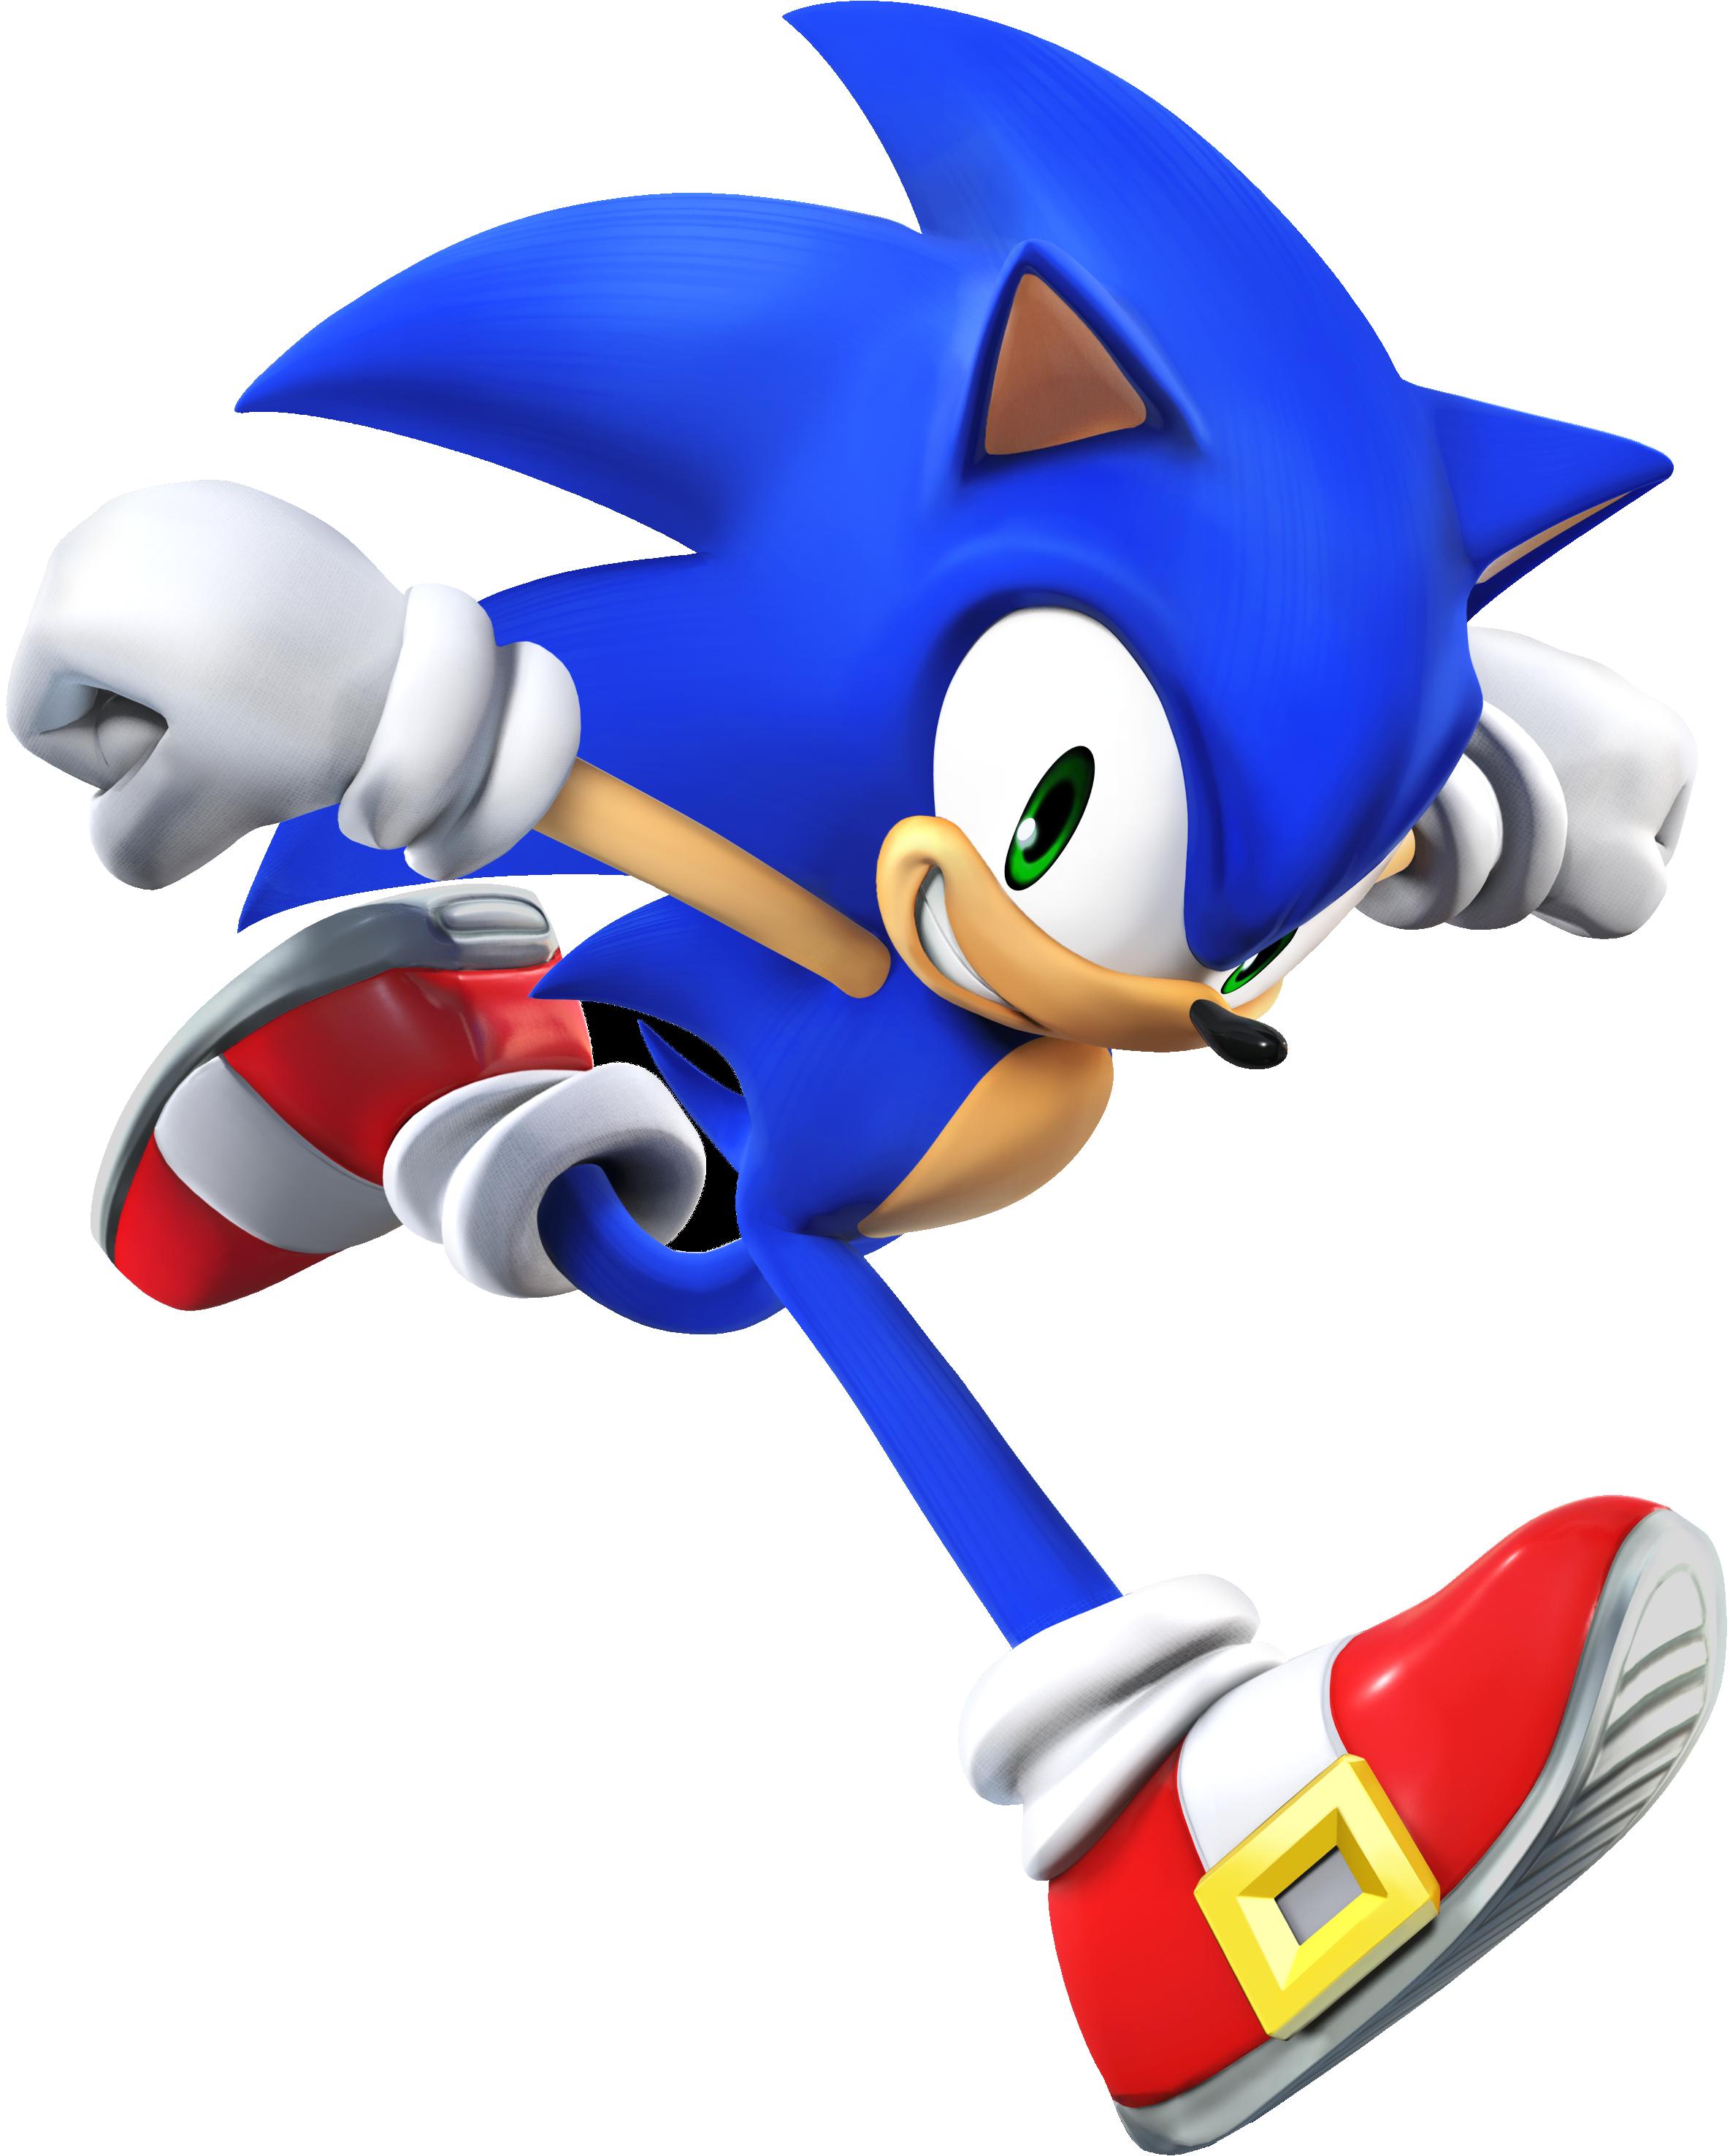 File:Sonic the Hedgehog in Super Smash Bros. for Nintendo 3DS & Wii U.png